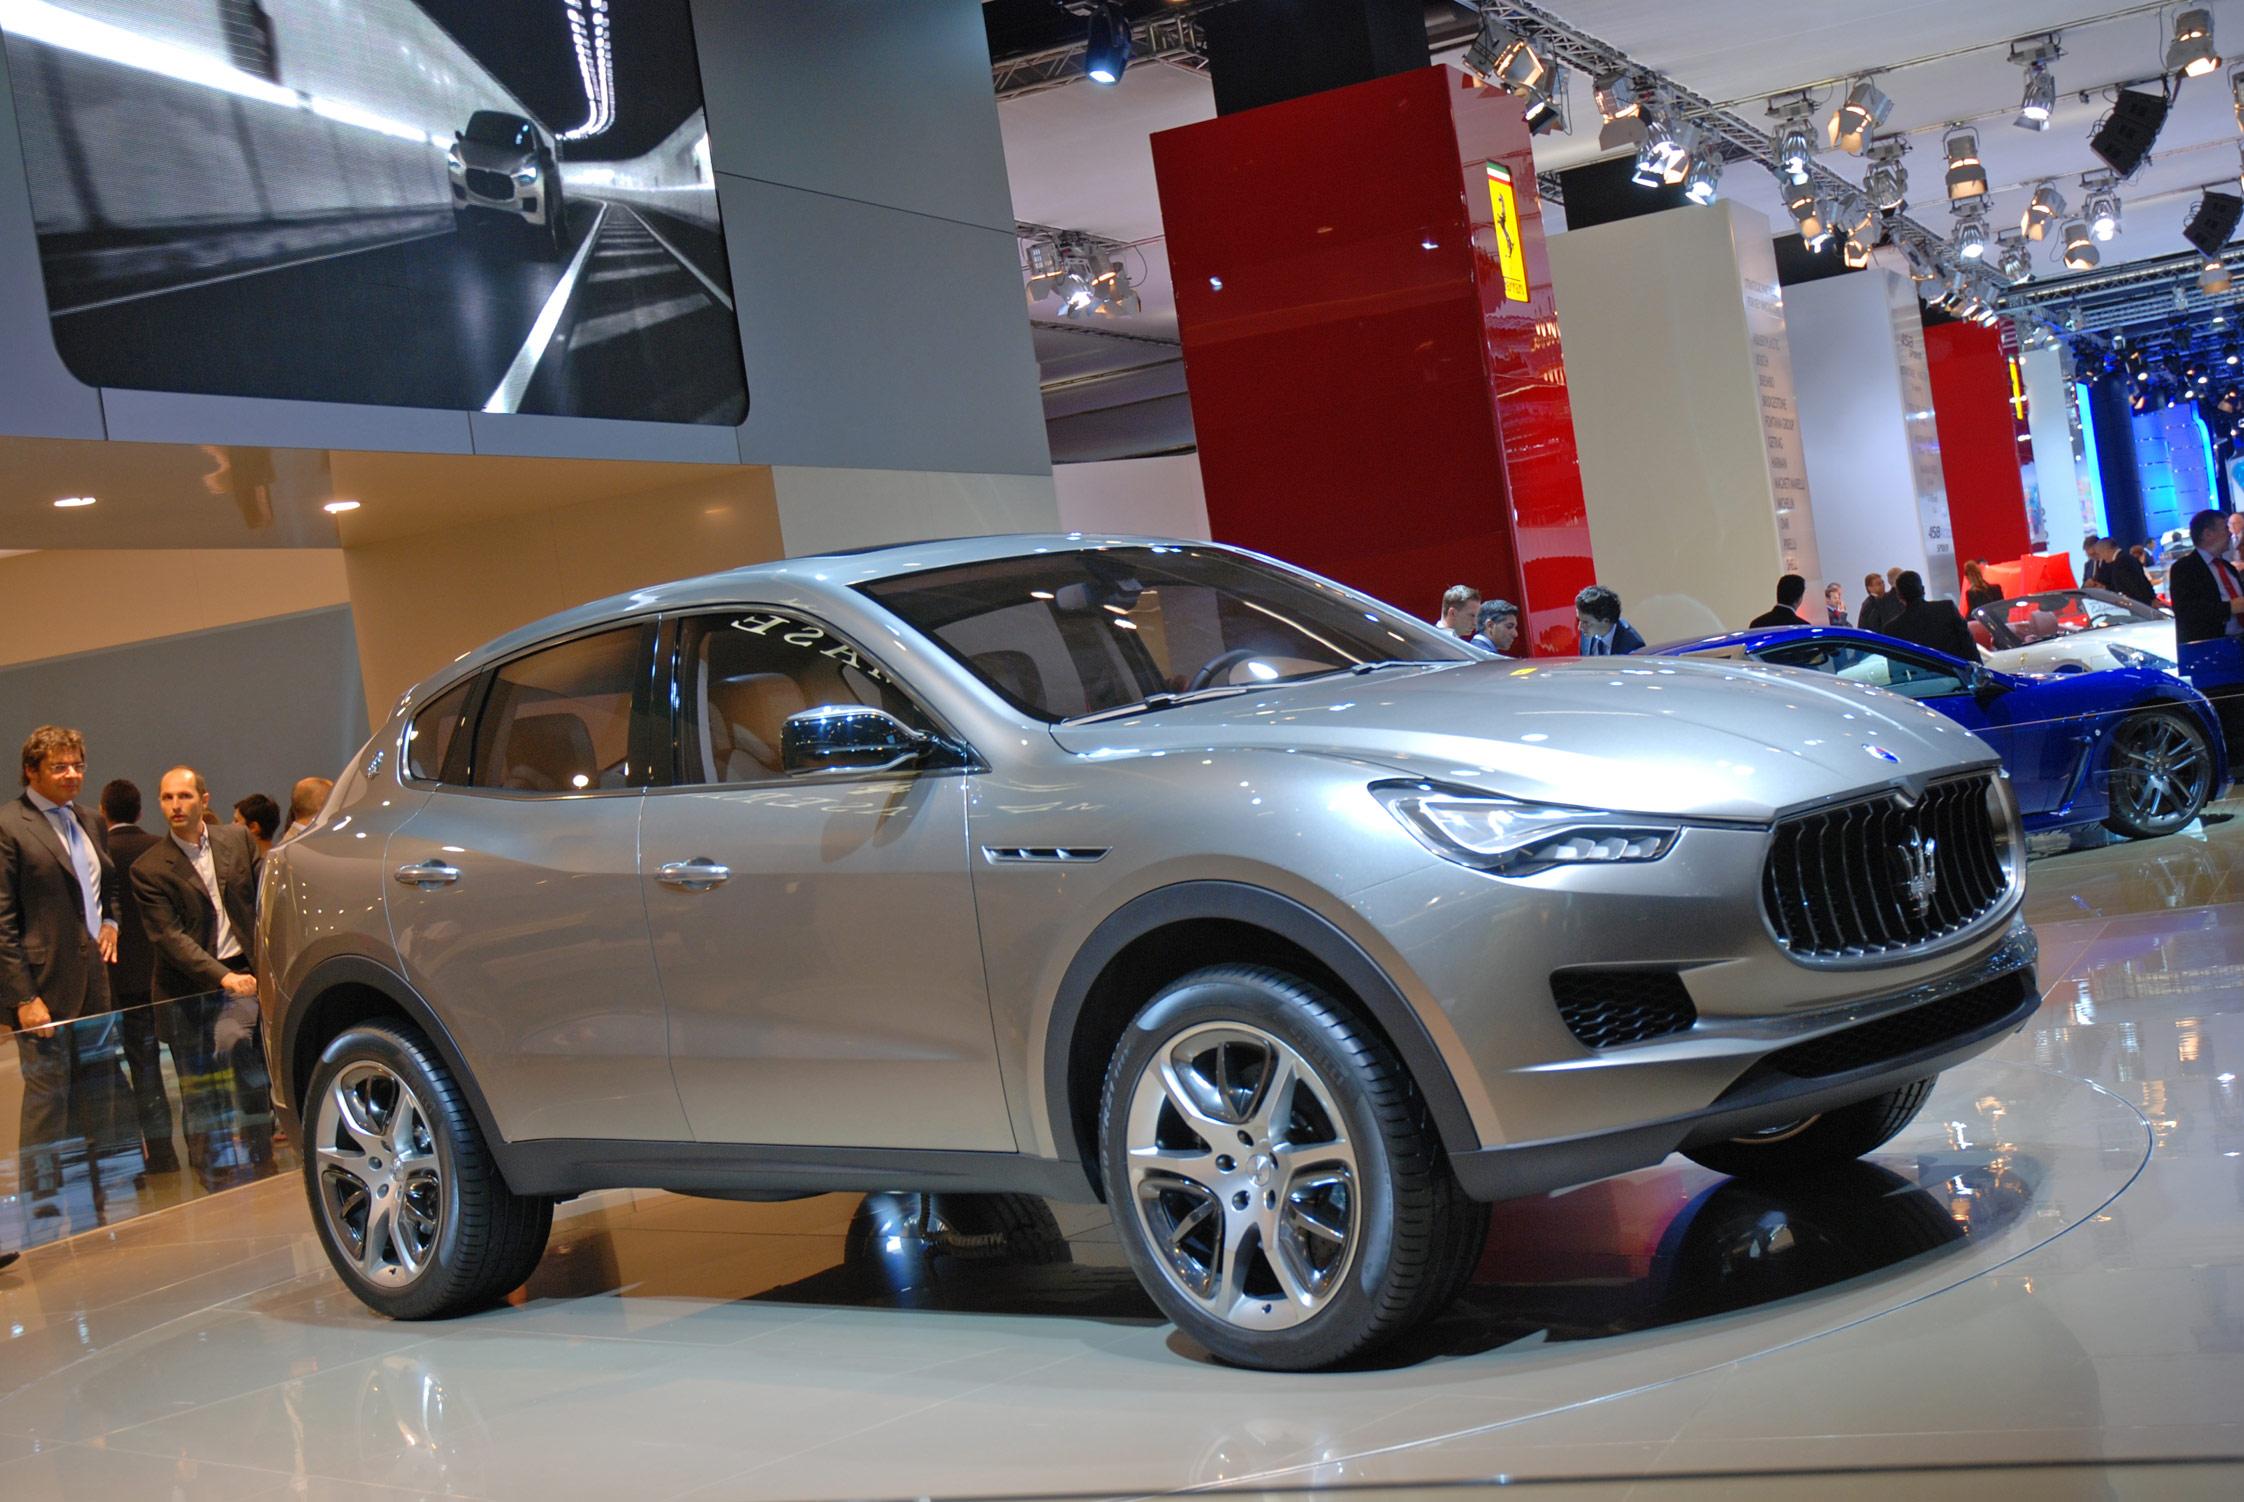 http://photo-voiture.motorlegend.com/hd/maserati-kubang-concept-67397.jpg